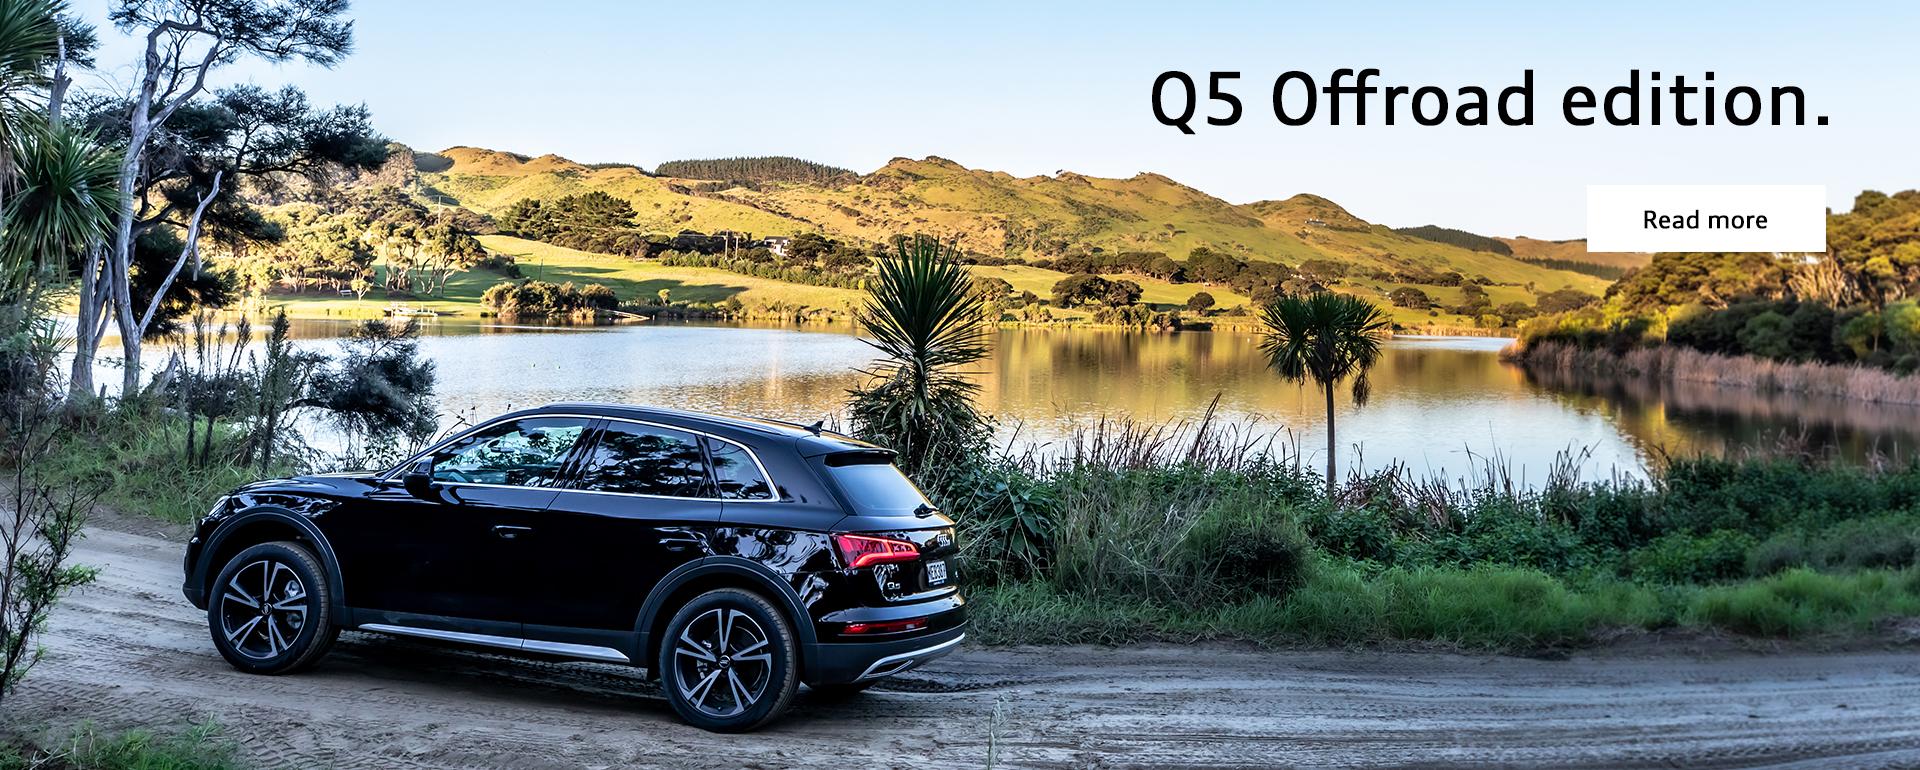 Q5 Offroad